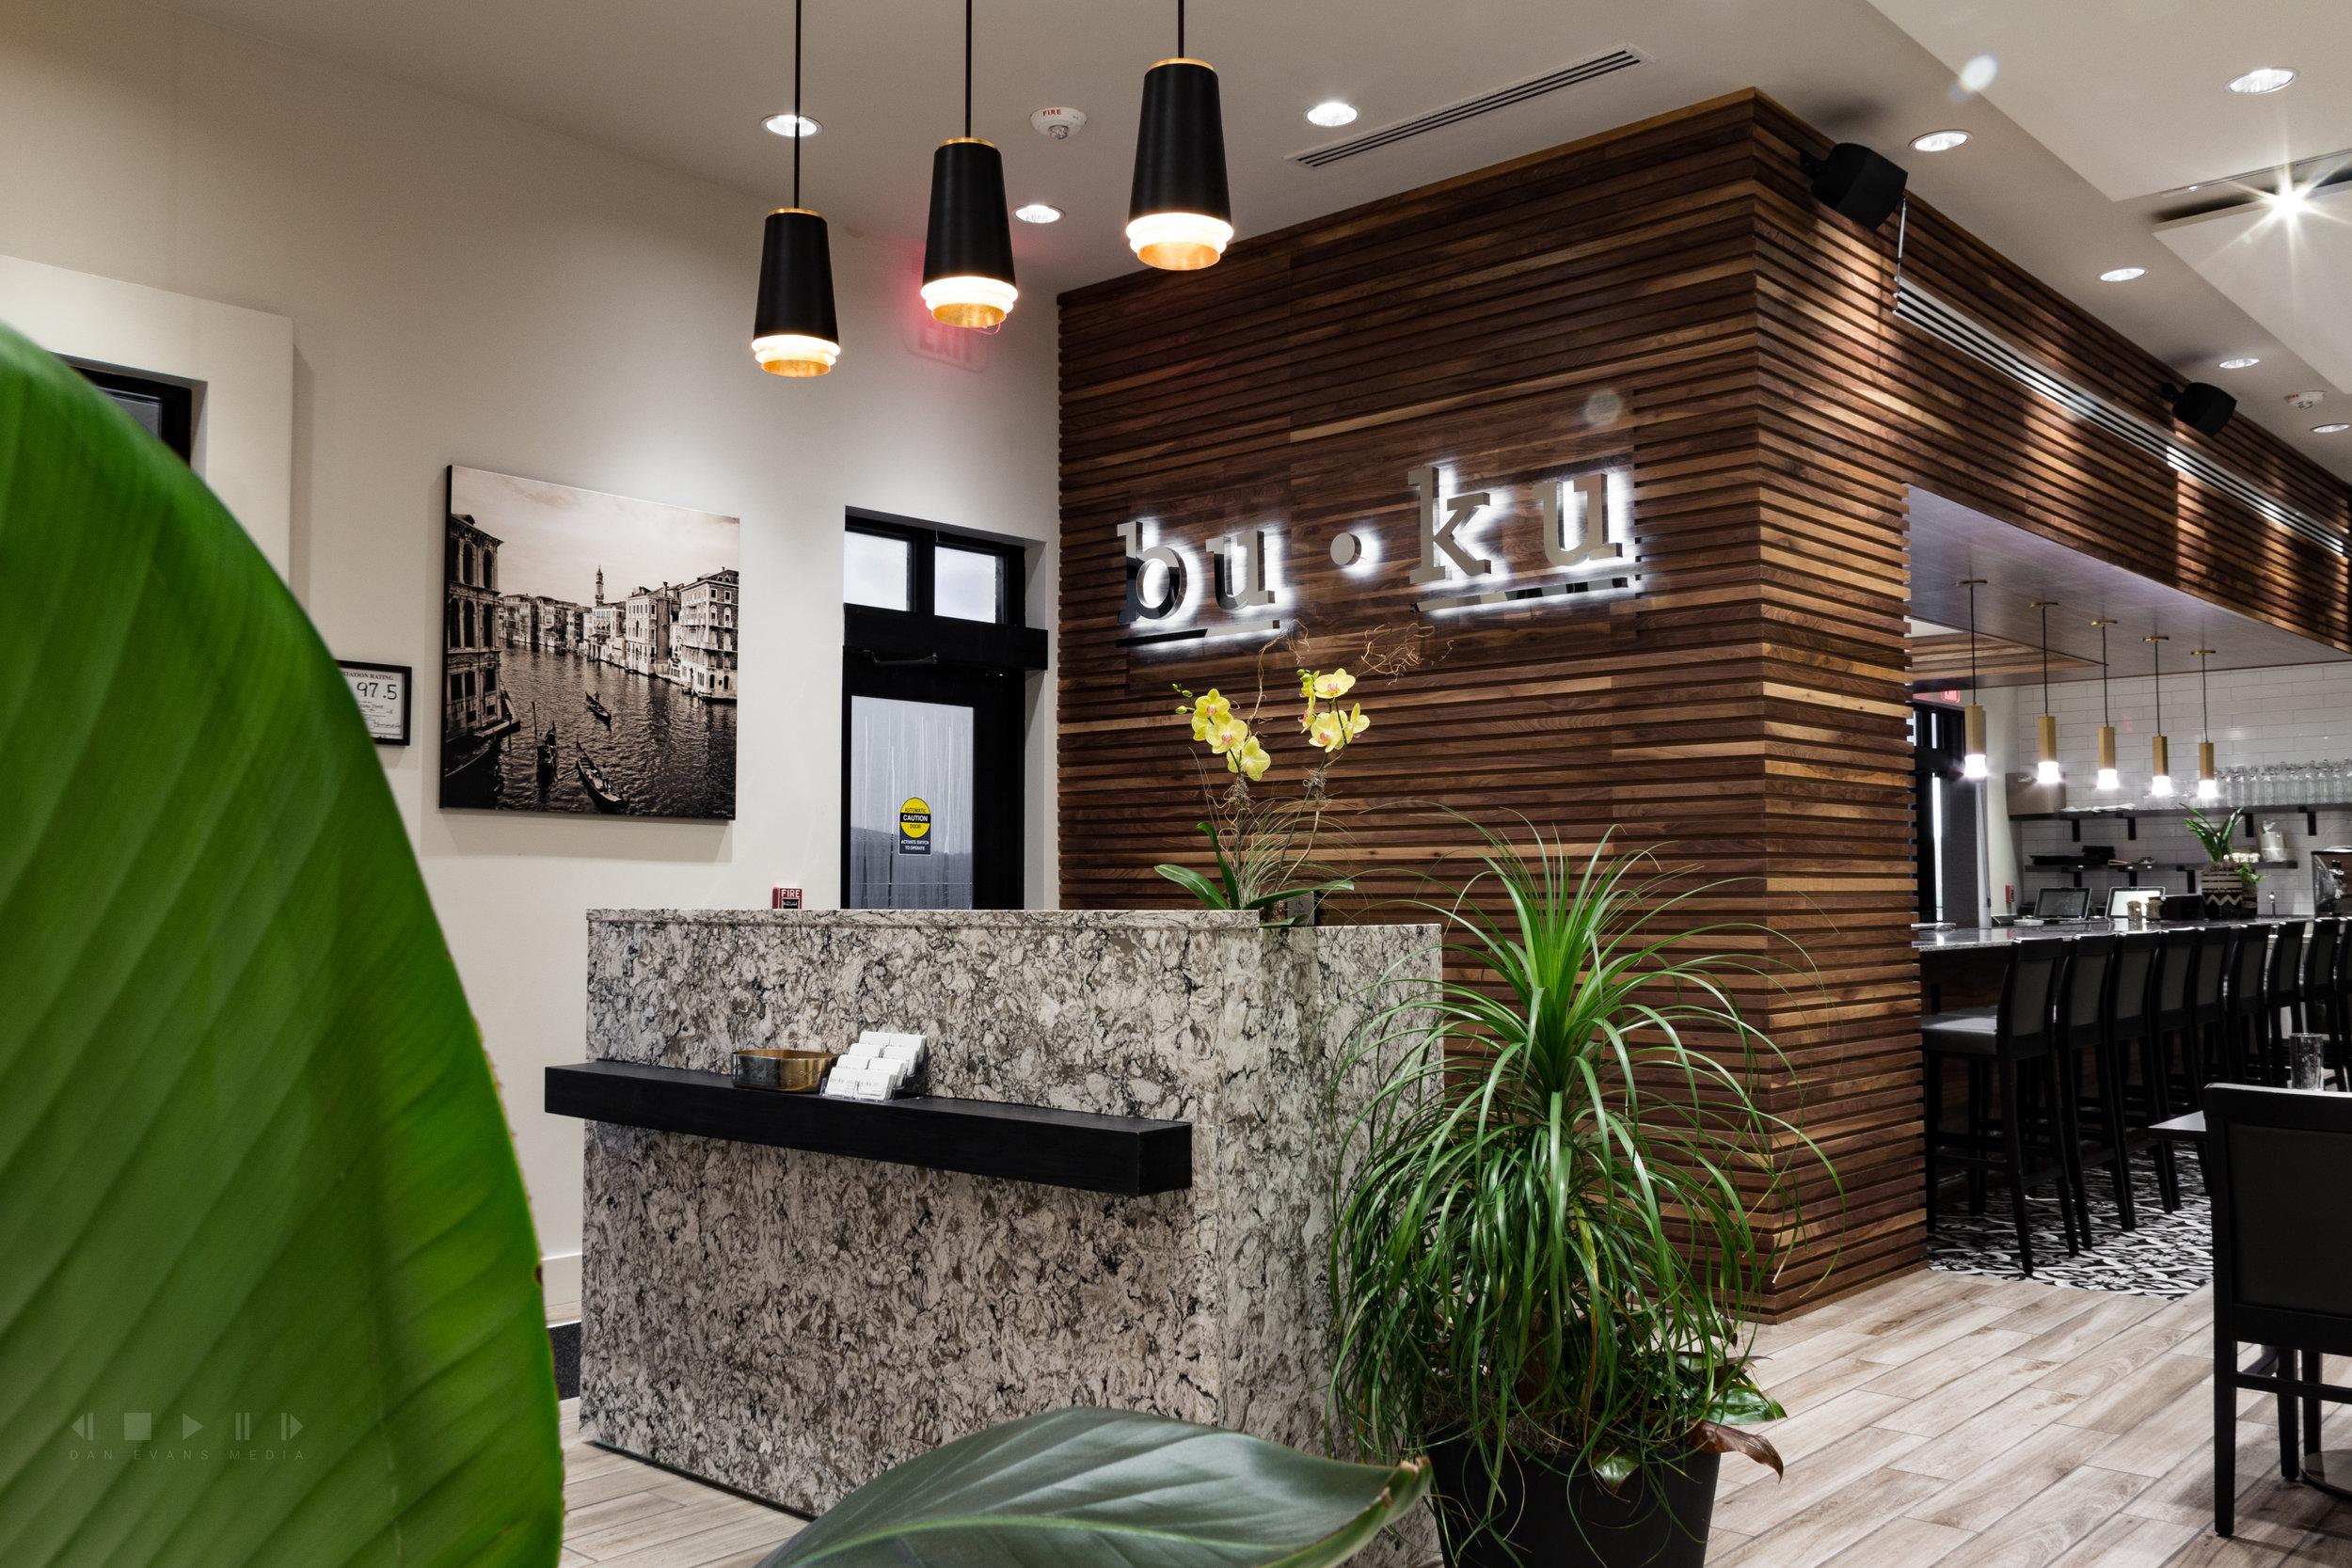 SU-2018-07-07_FDB_Interior-Upfit_BuKu-Wake-Forest-1.JPG